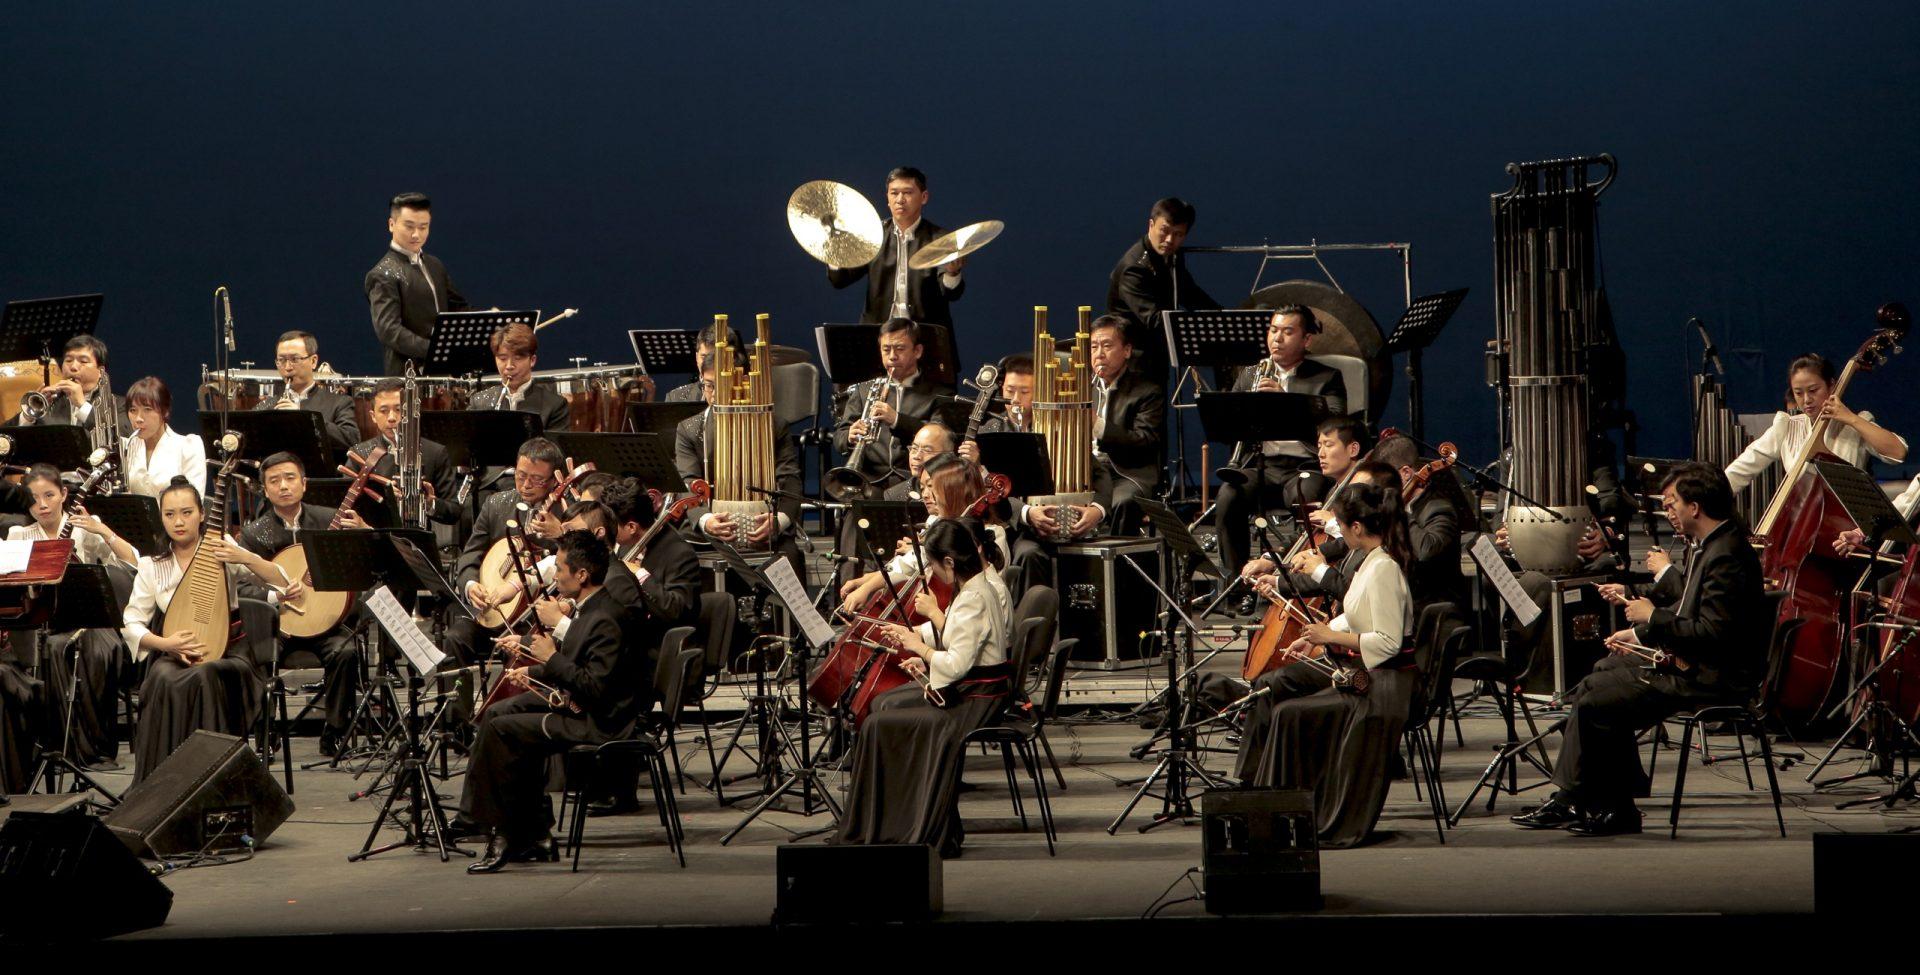 orquesta-sinfonica-de-china_0175